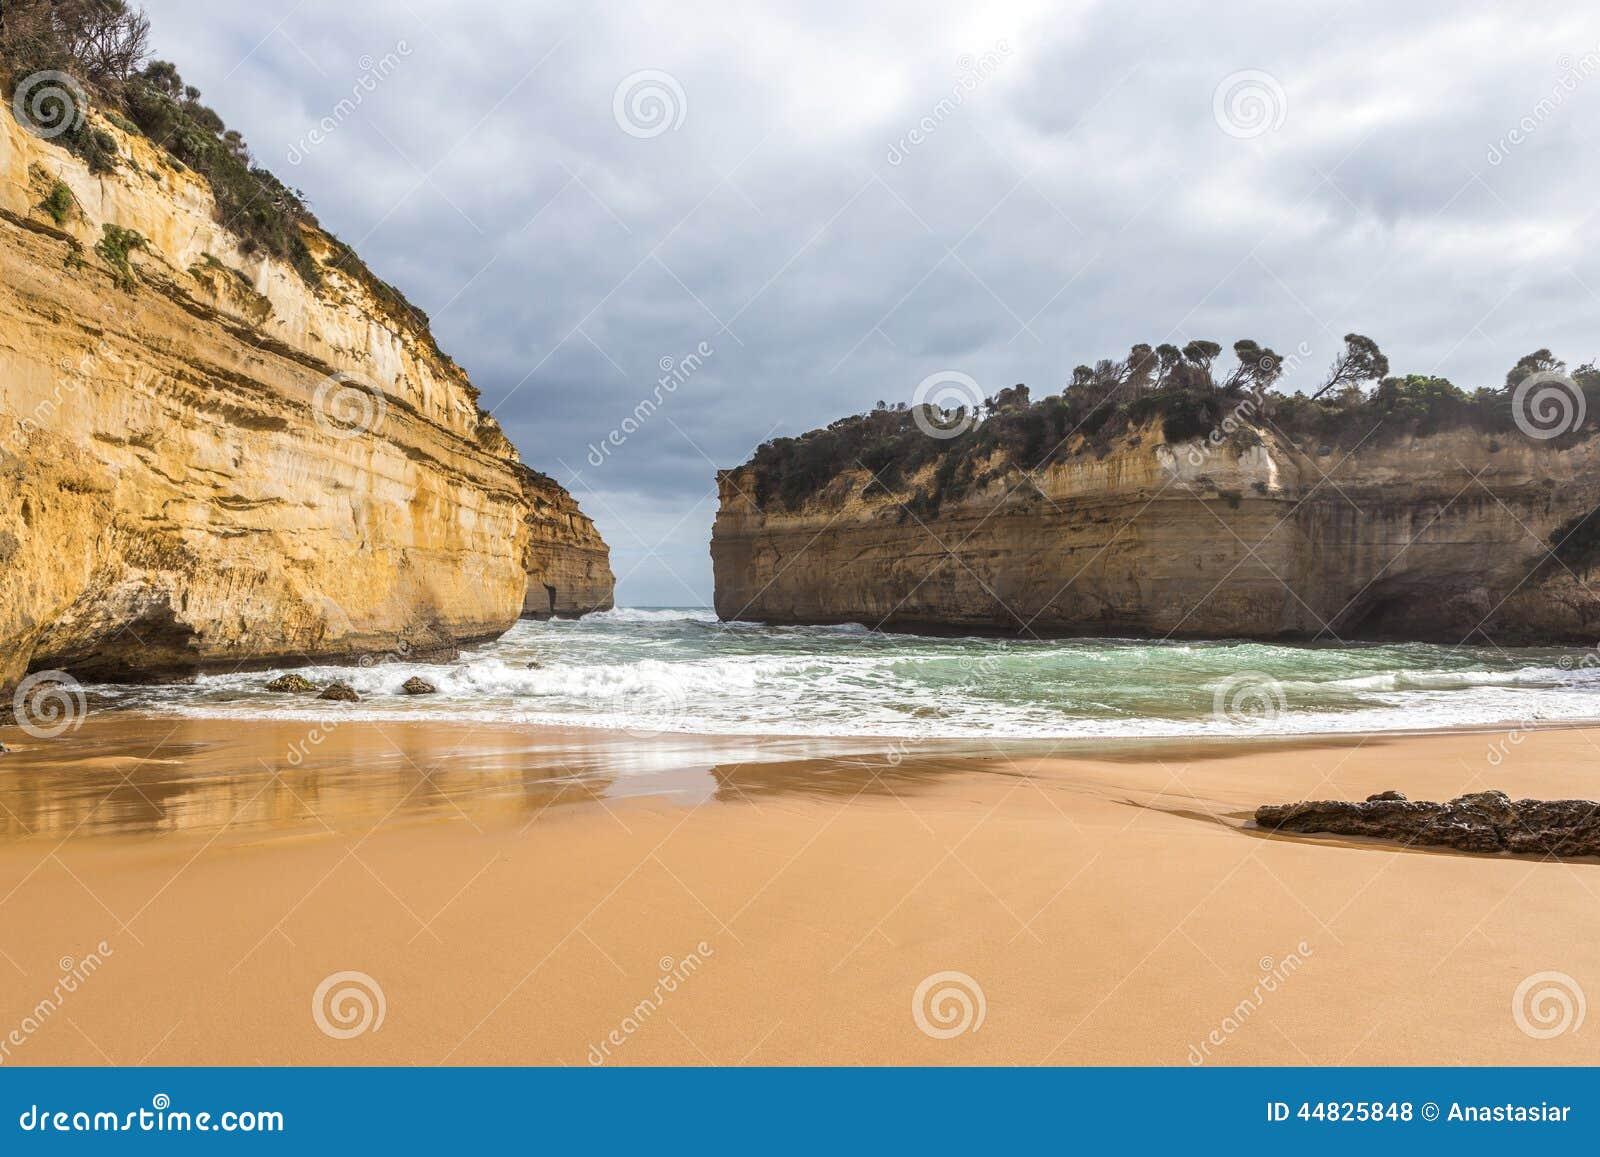 Rocks Around The Beach Stock Photo - Image: 44825848